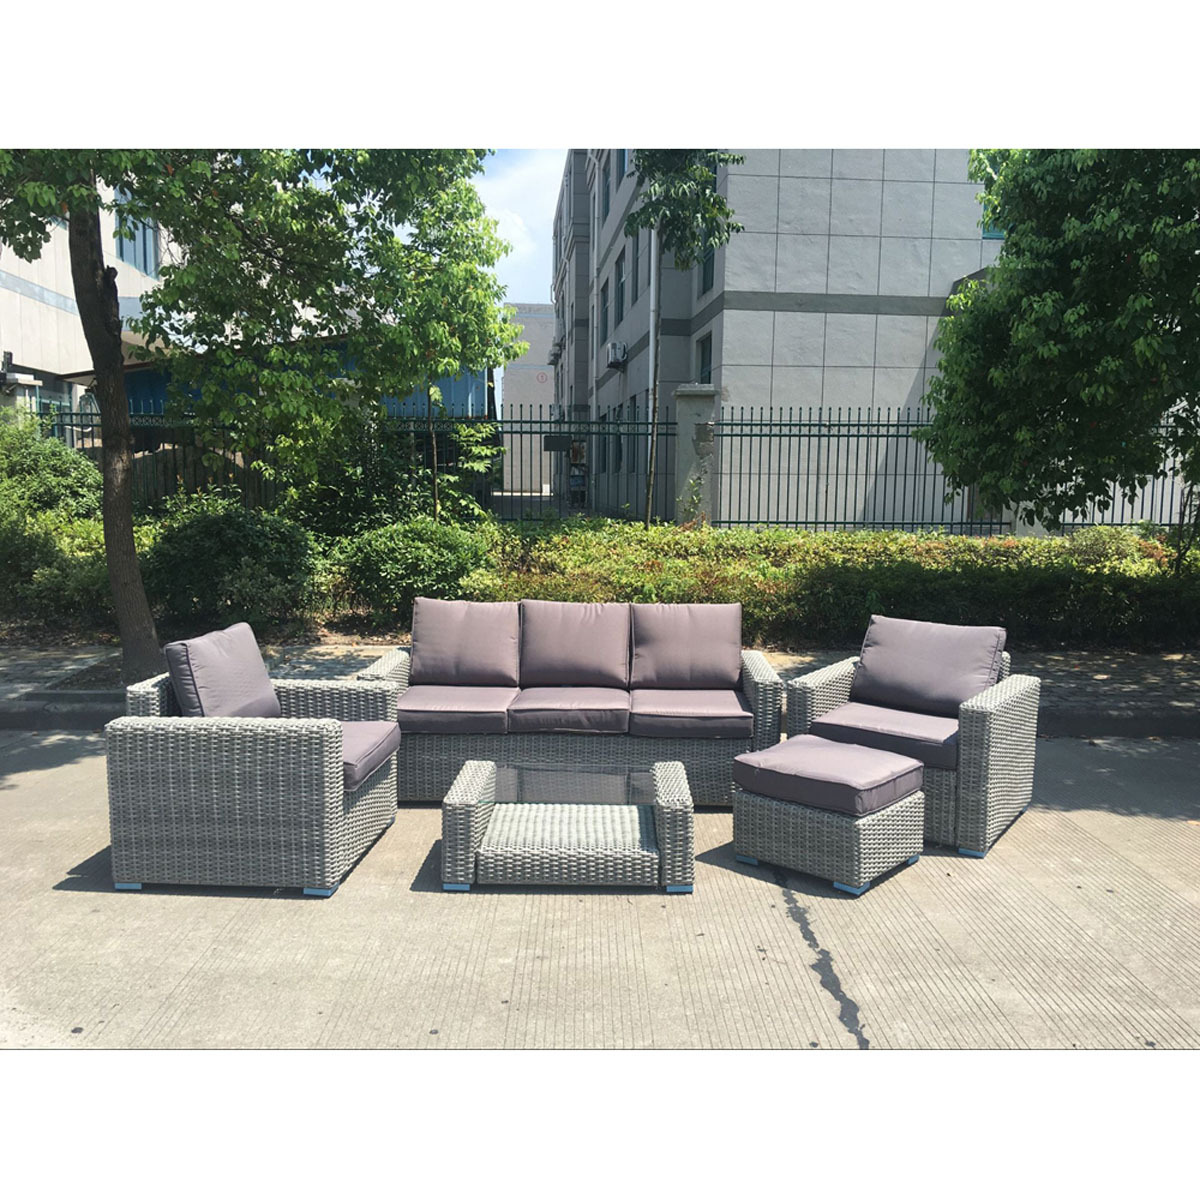 Image Is Loading 5pc Amalfi Wicker Rattan Outdoor Furniture Garden Lounge